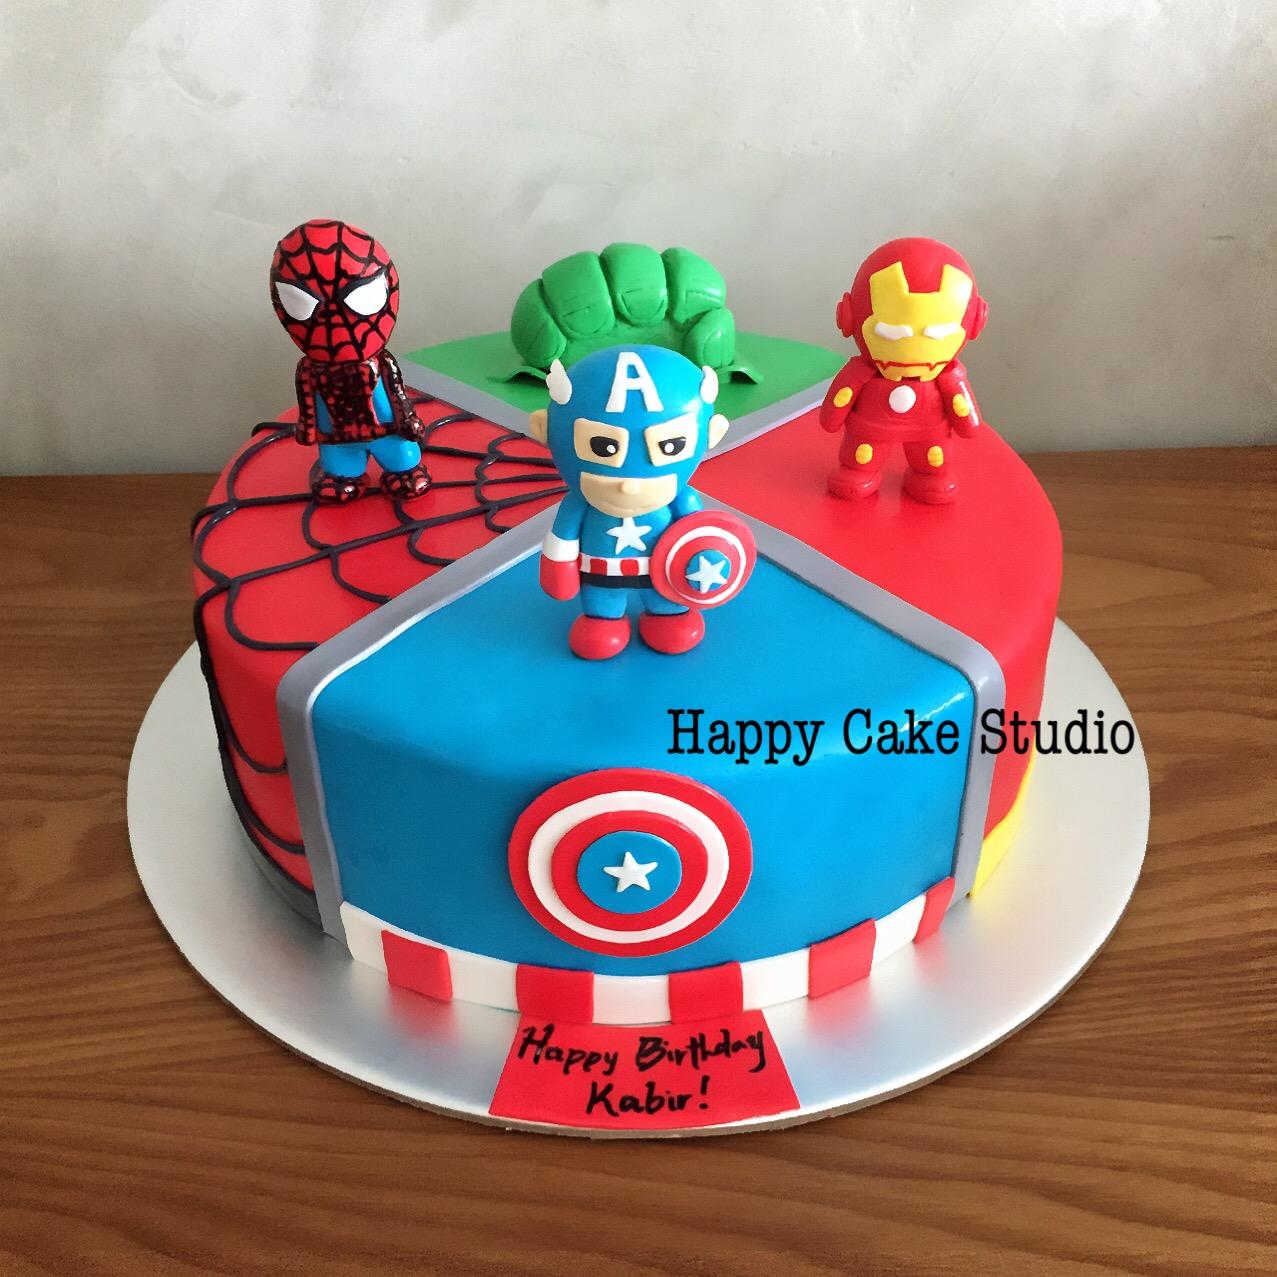 Sensational Customized Cakes At Walmart Wedding Decor And Hairstyle Ideas Funny Birthday Cards Online Elaedamsfinfo